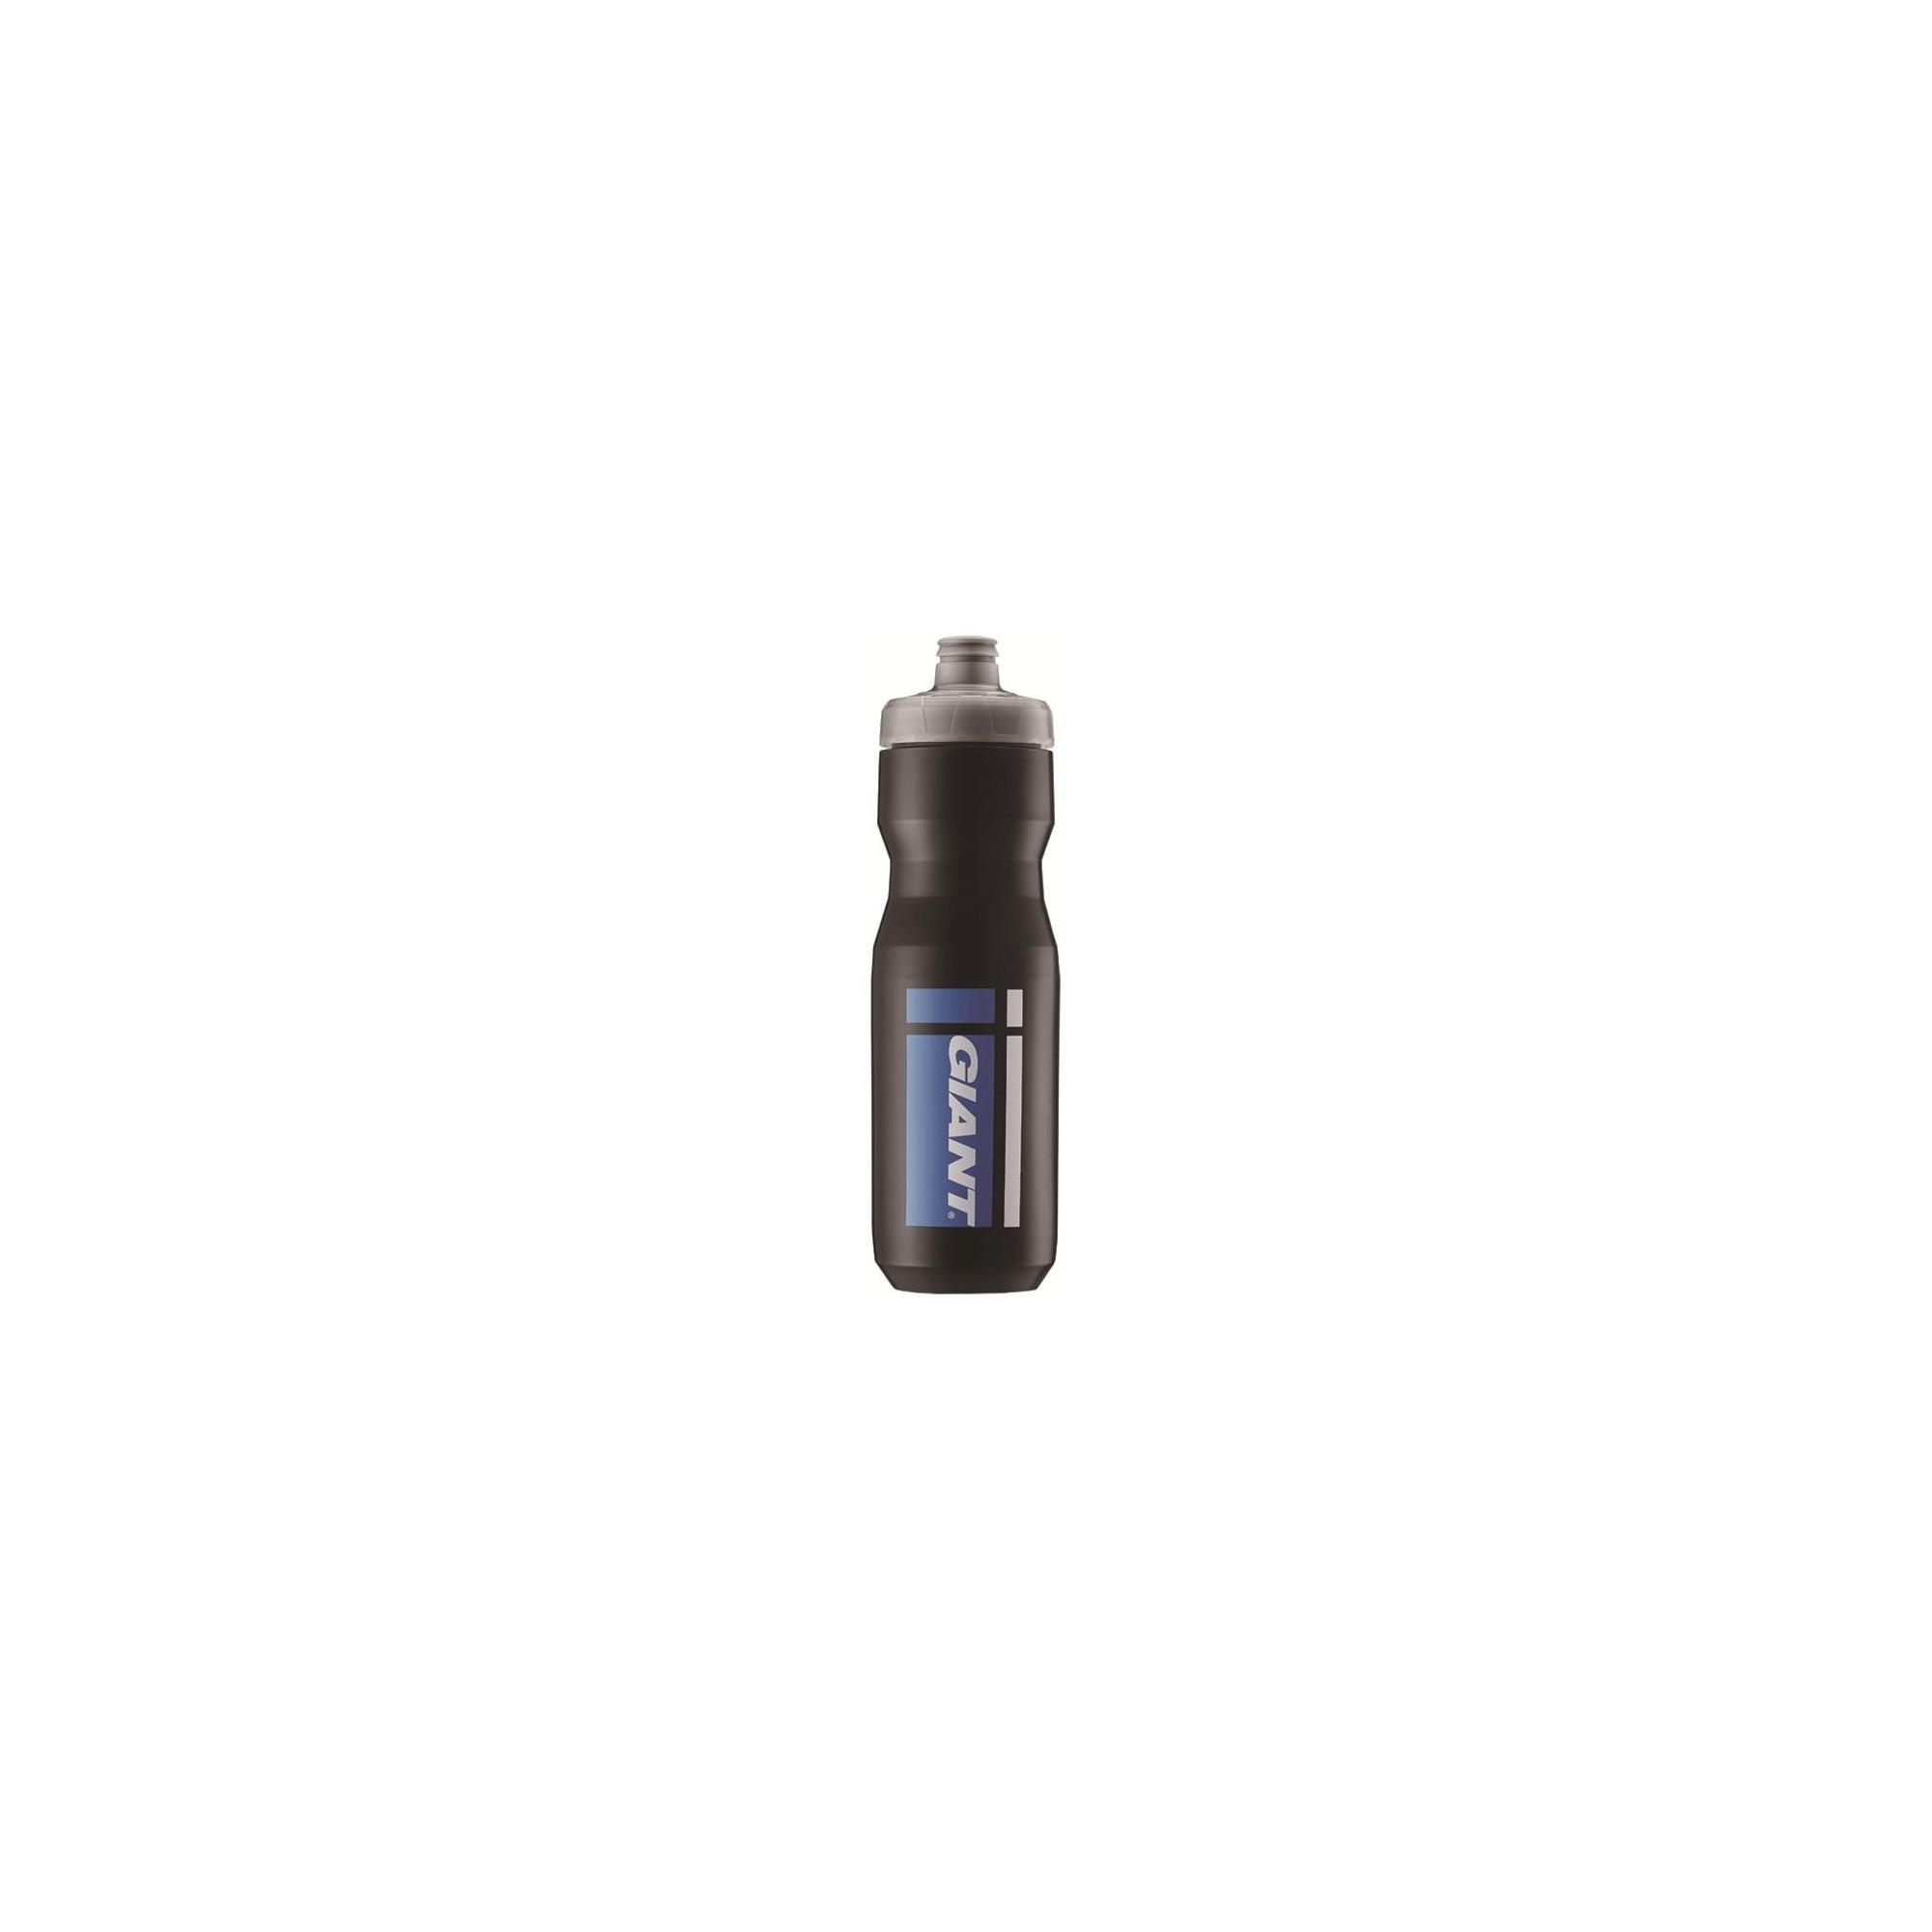 Bidon Giant Fast Cleanspring noir-bleu 600 & 750ml